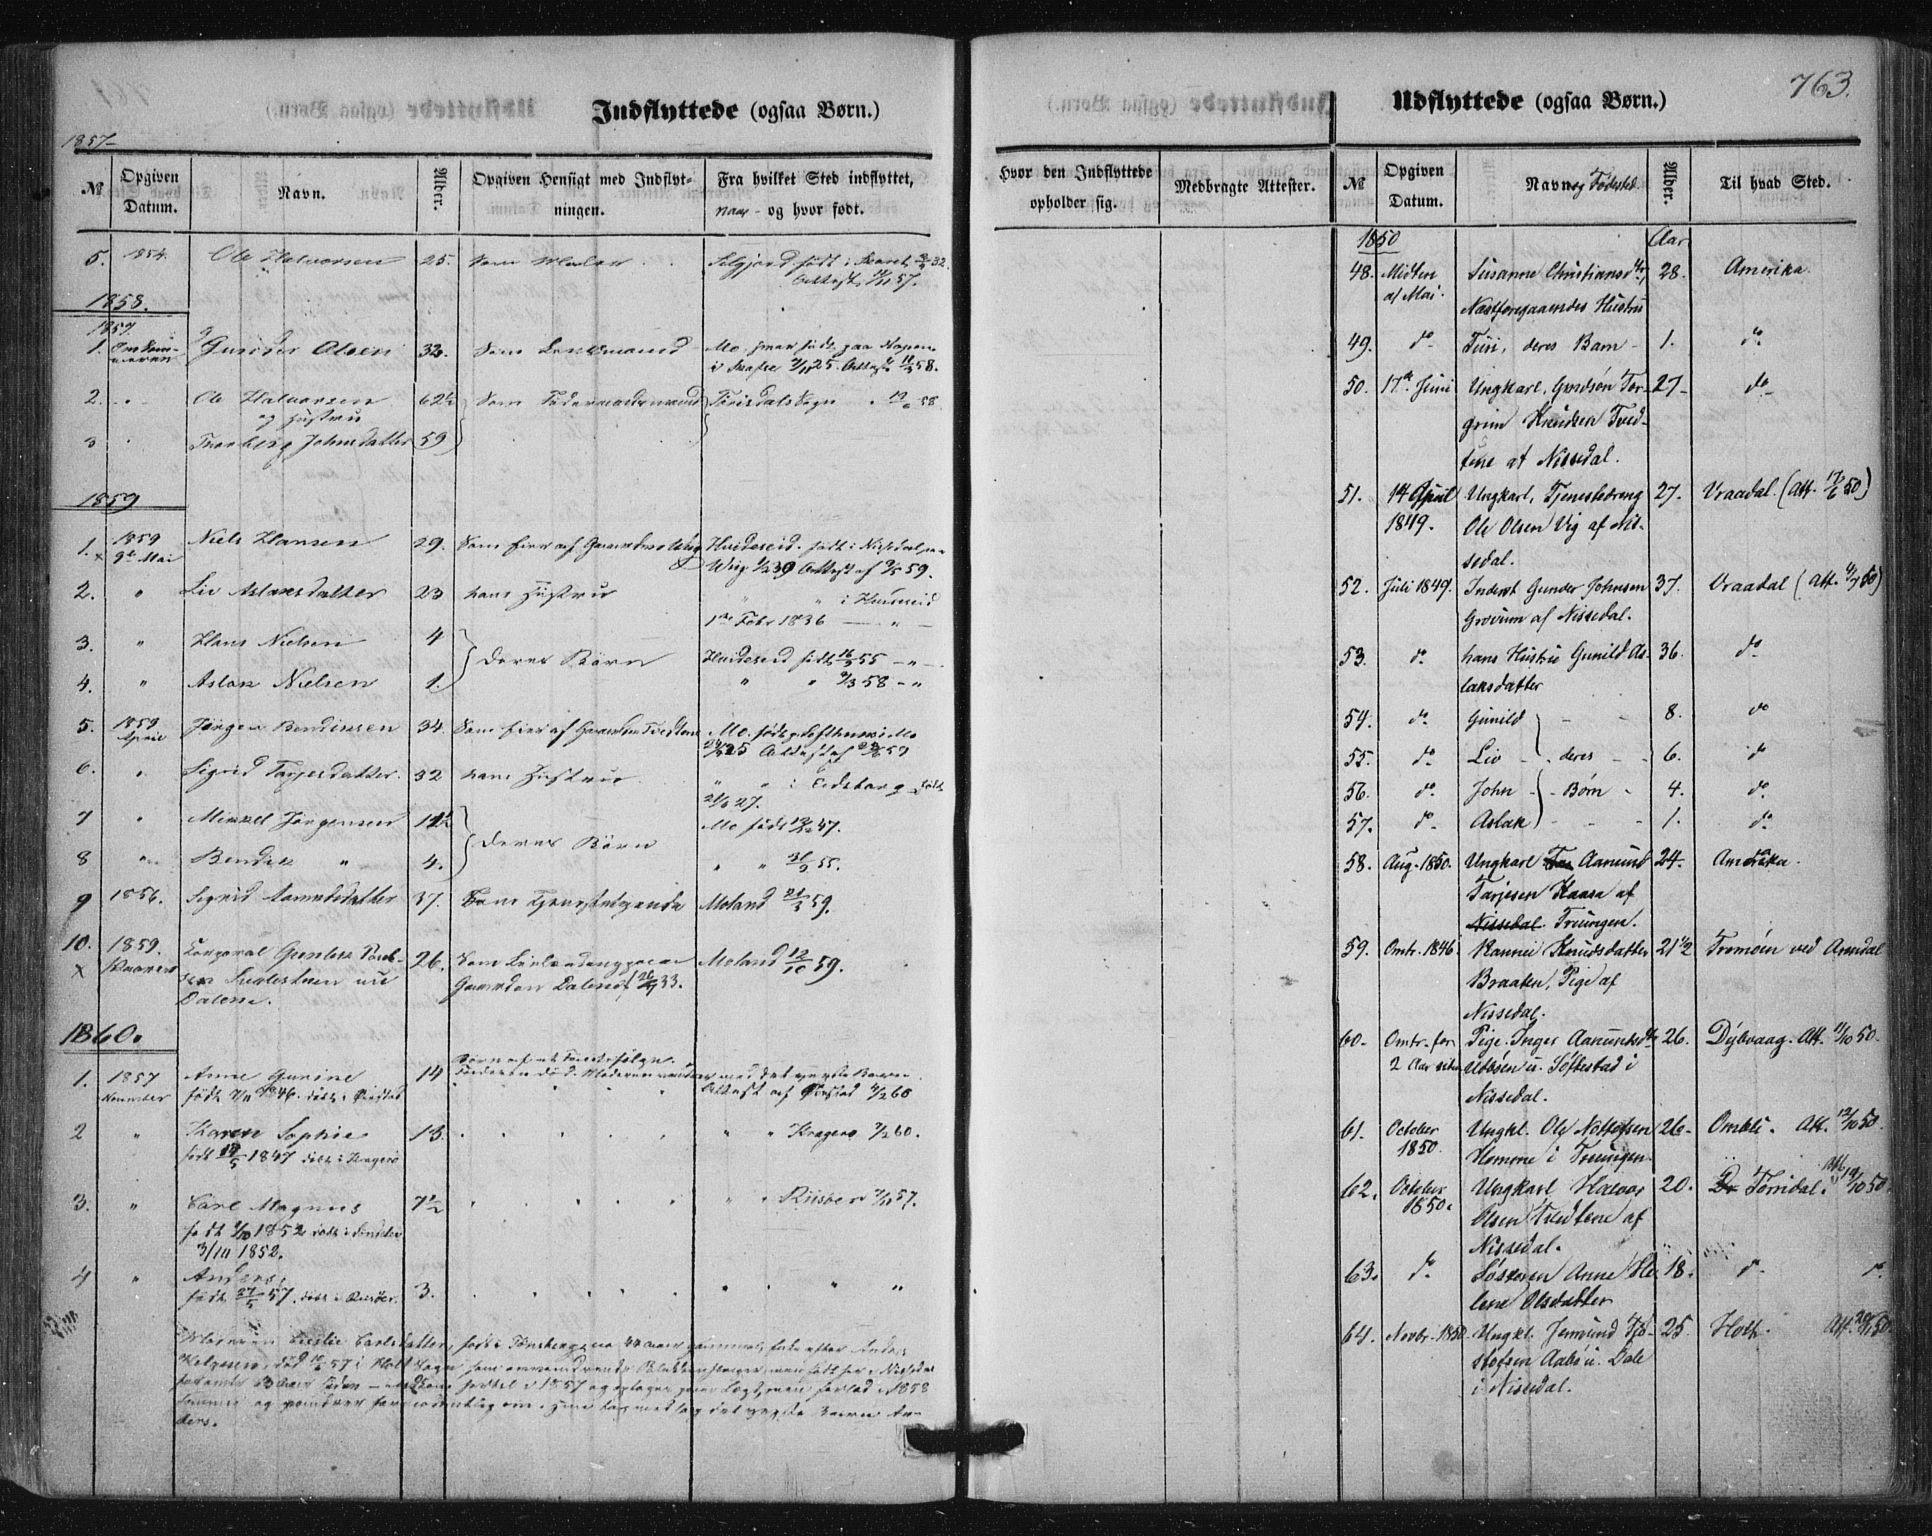 SAKO, Nissedal kirkebøker, F/Fa/L0003: Ministerialbok nr. I 3, 1846-1870, s. 762-763